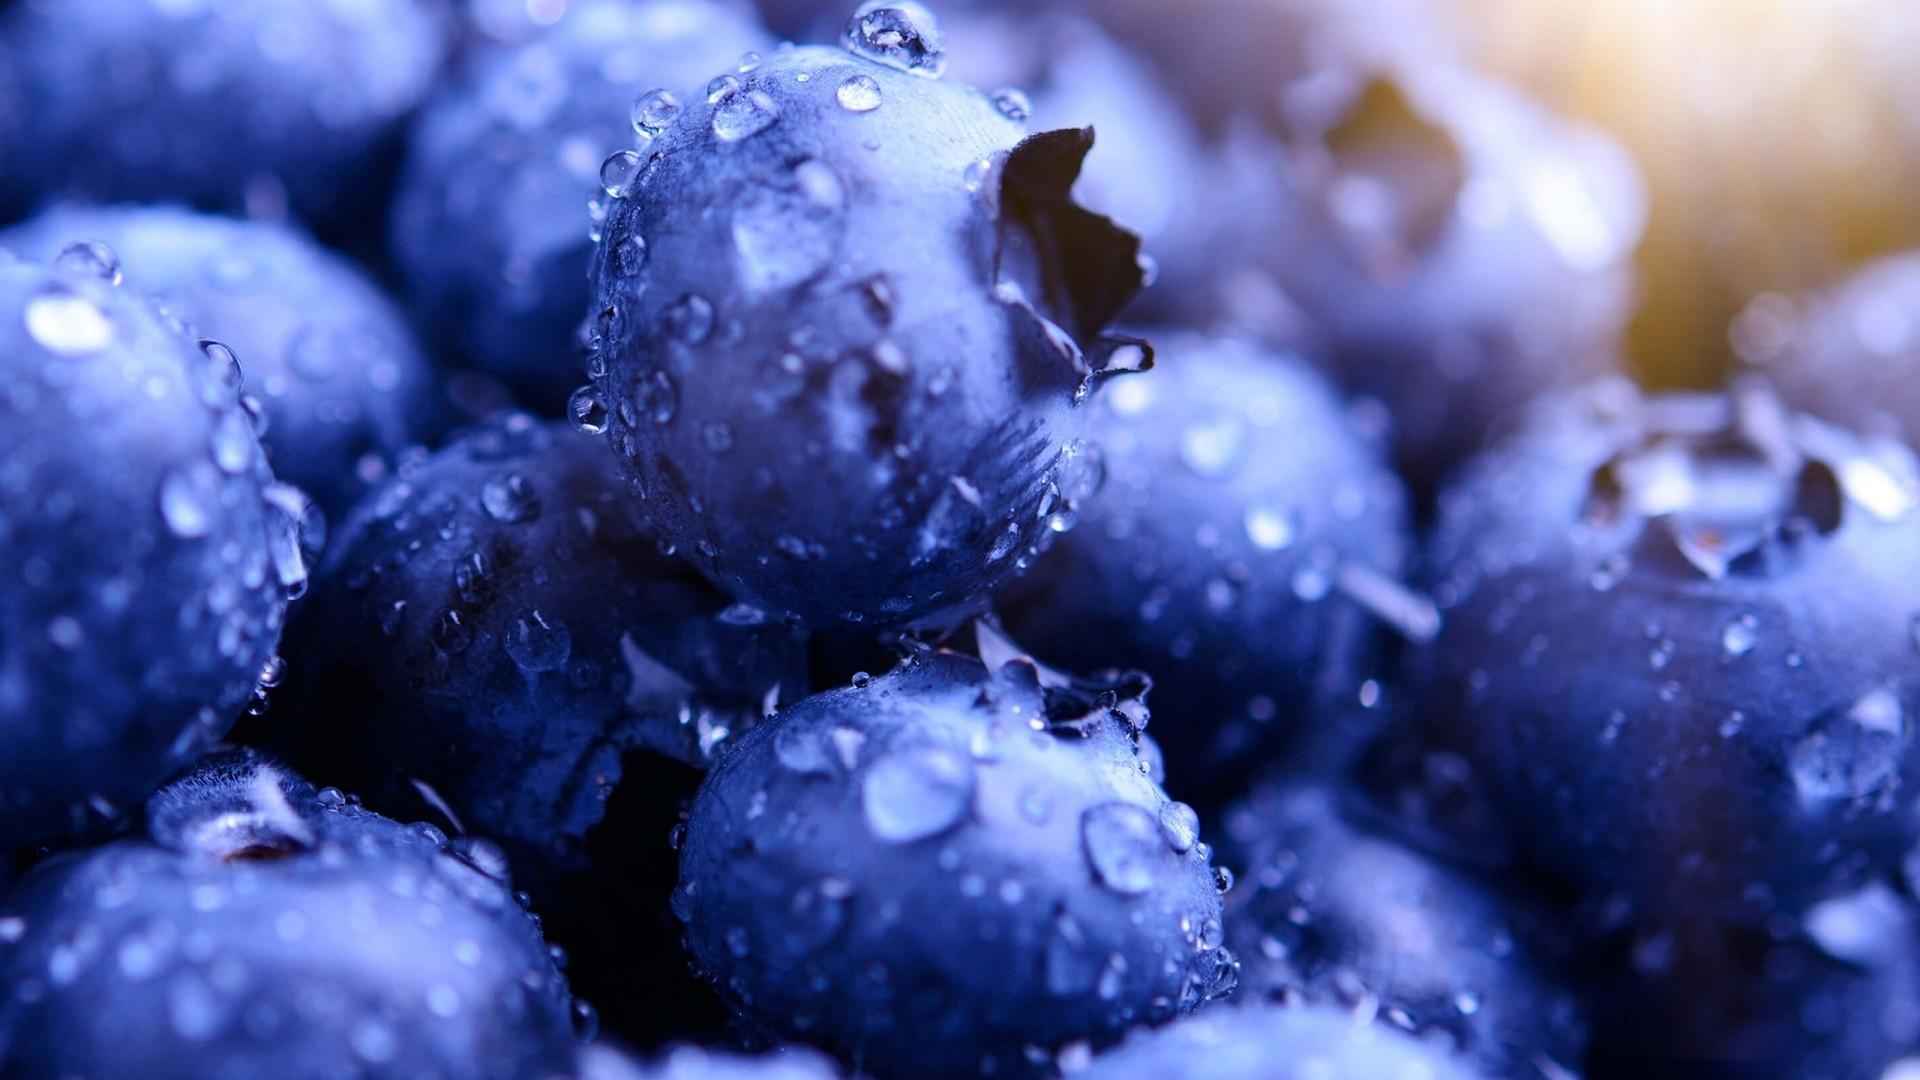 Blueberries Wallpaper theme